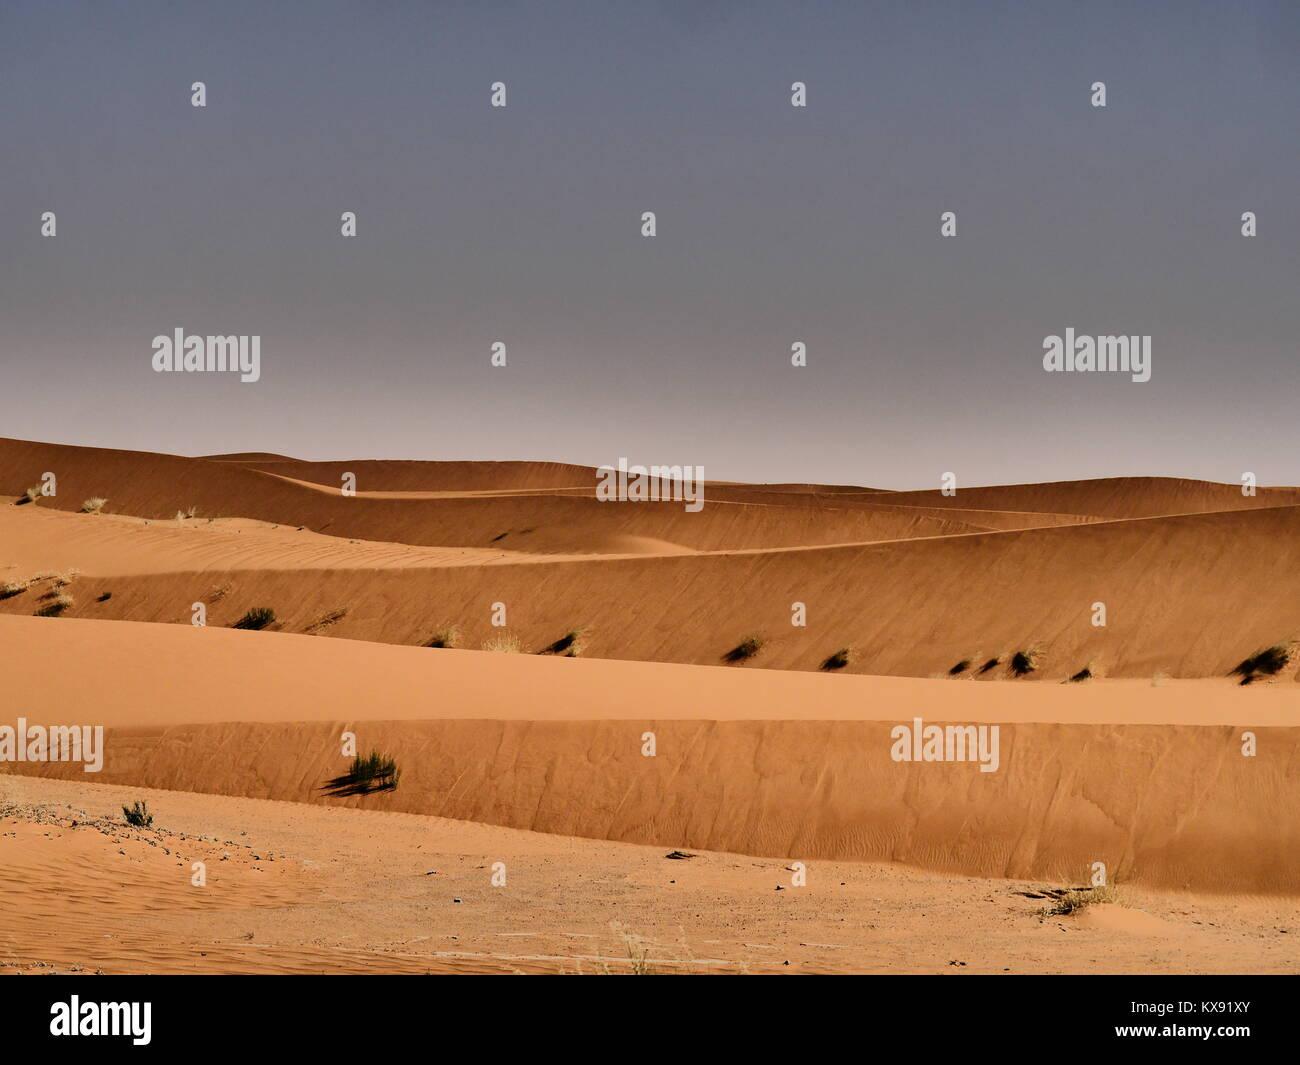 Travelling to the desert in Saudi Arabia - Stock Image